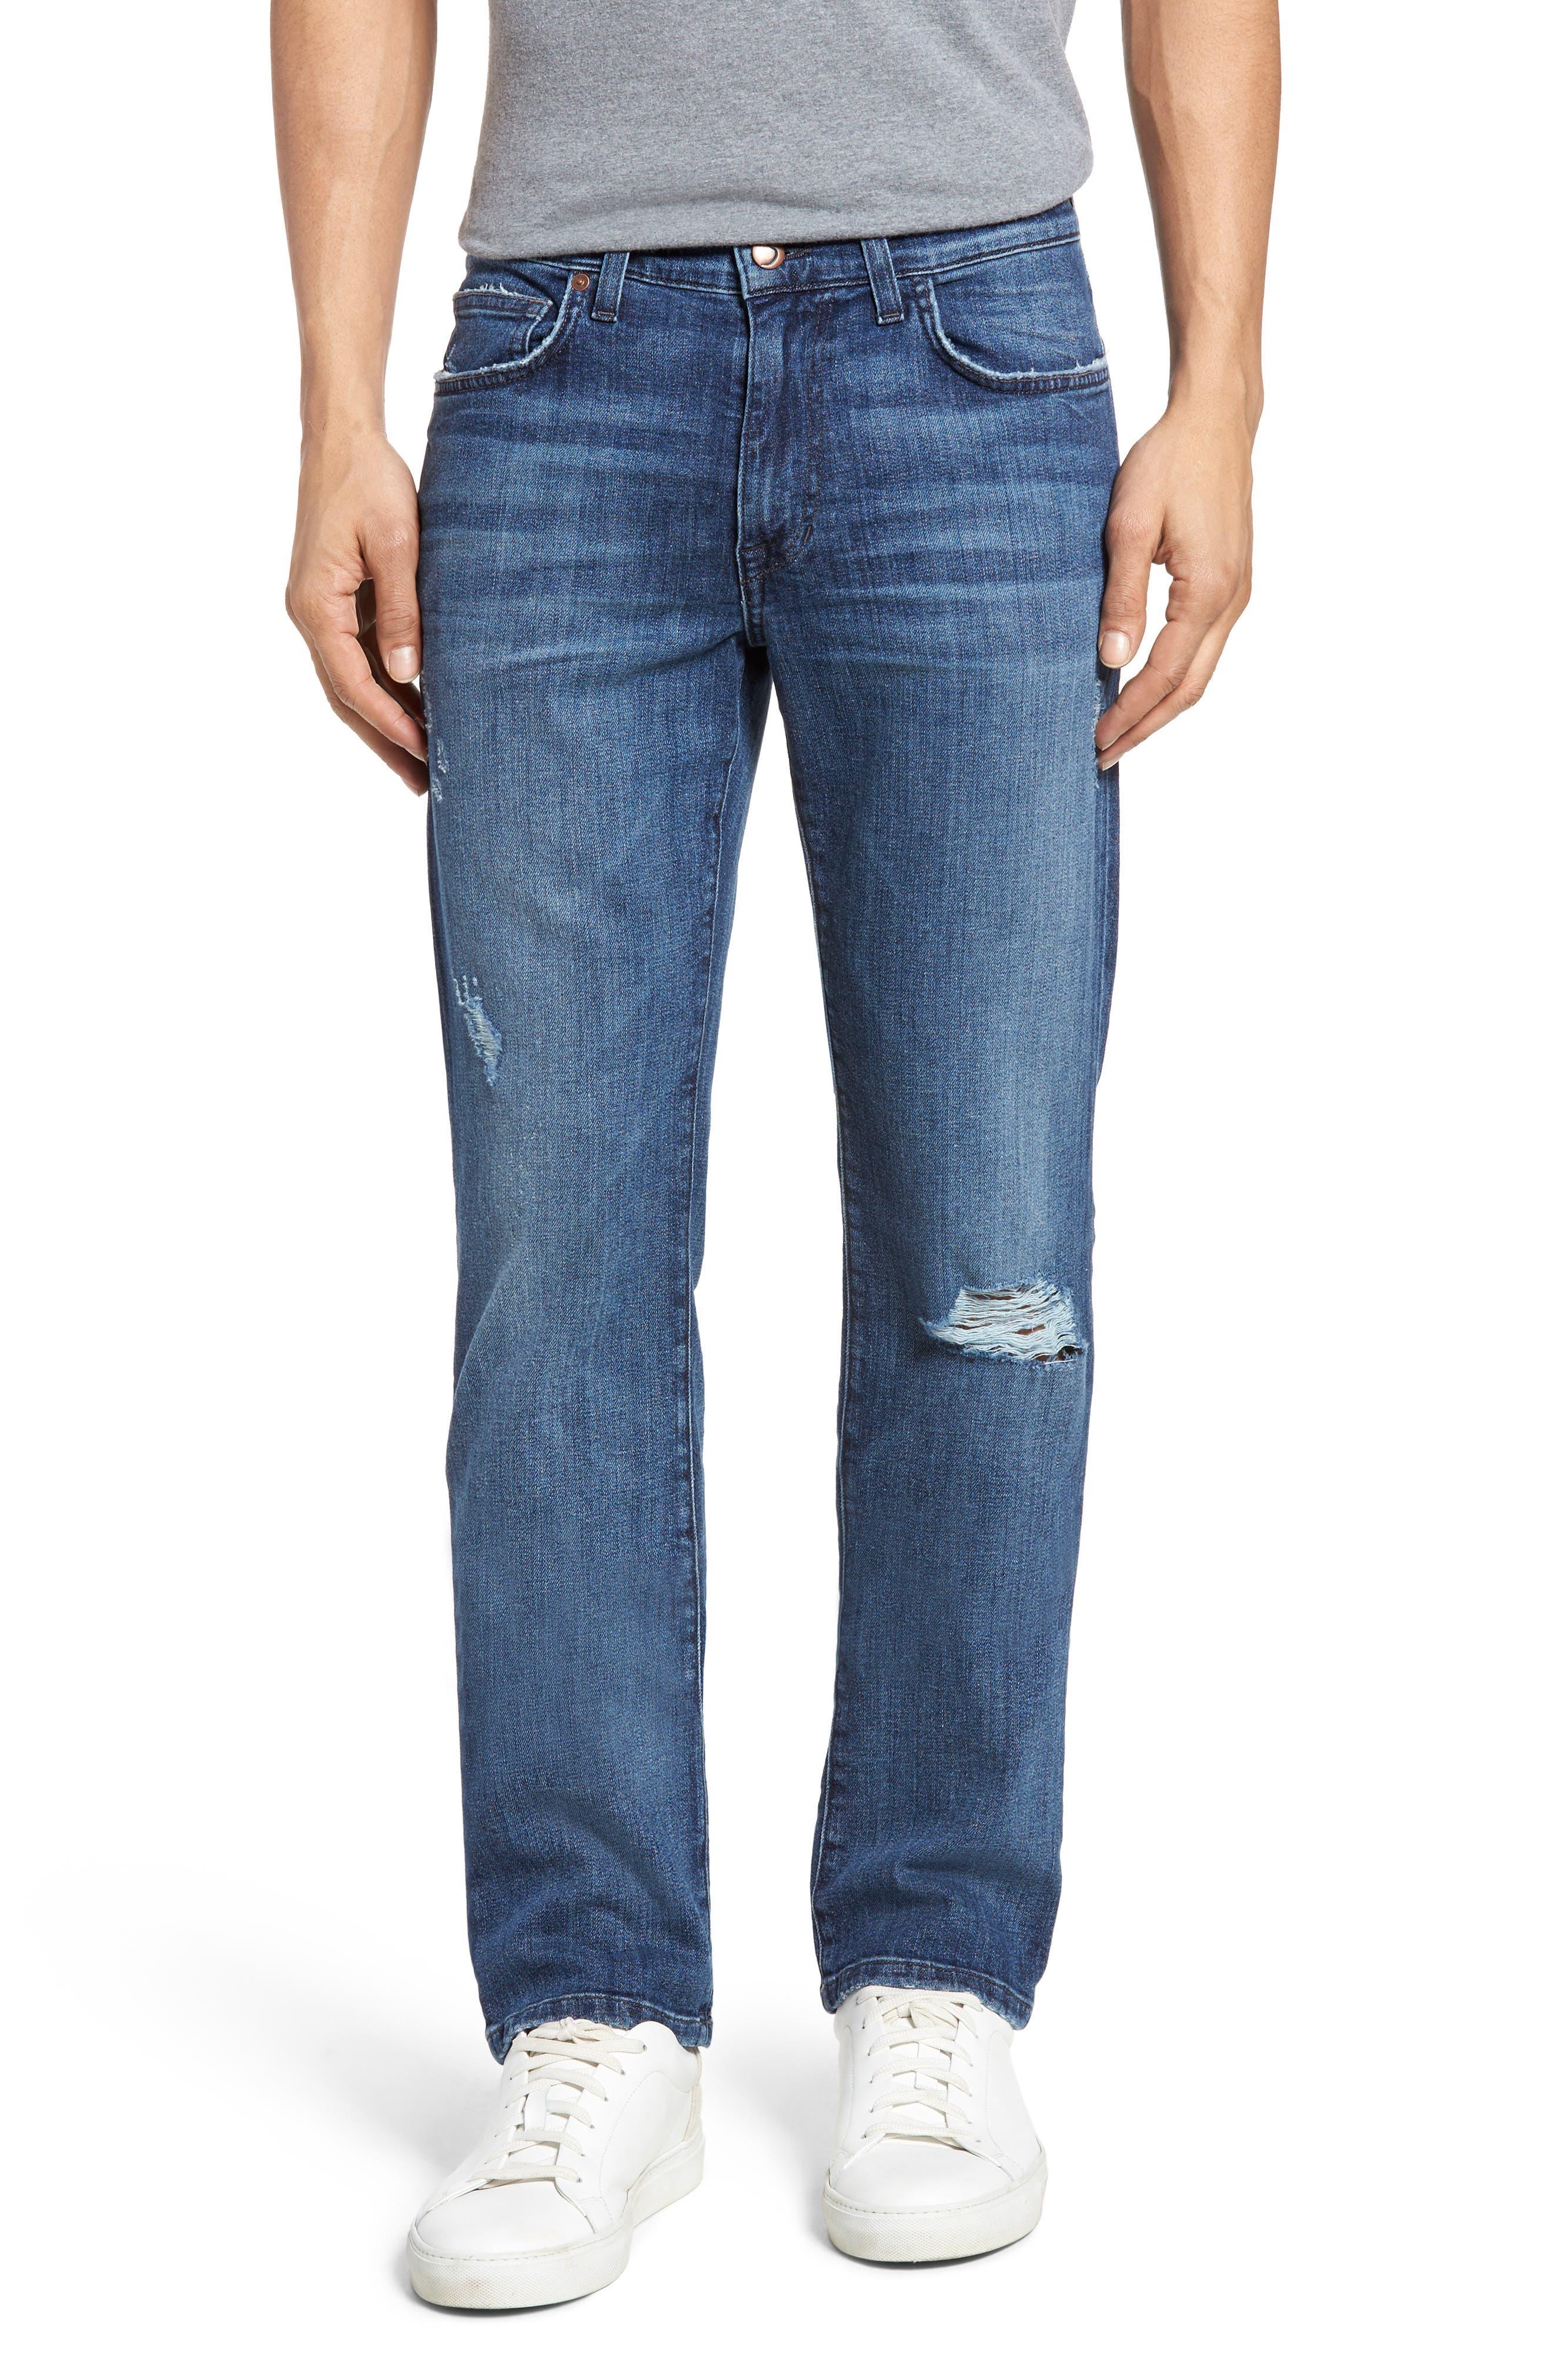 JOES Brixton Slim Straight Leg Jeans